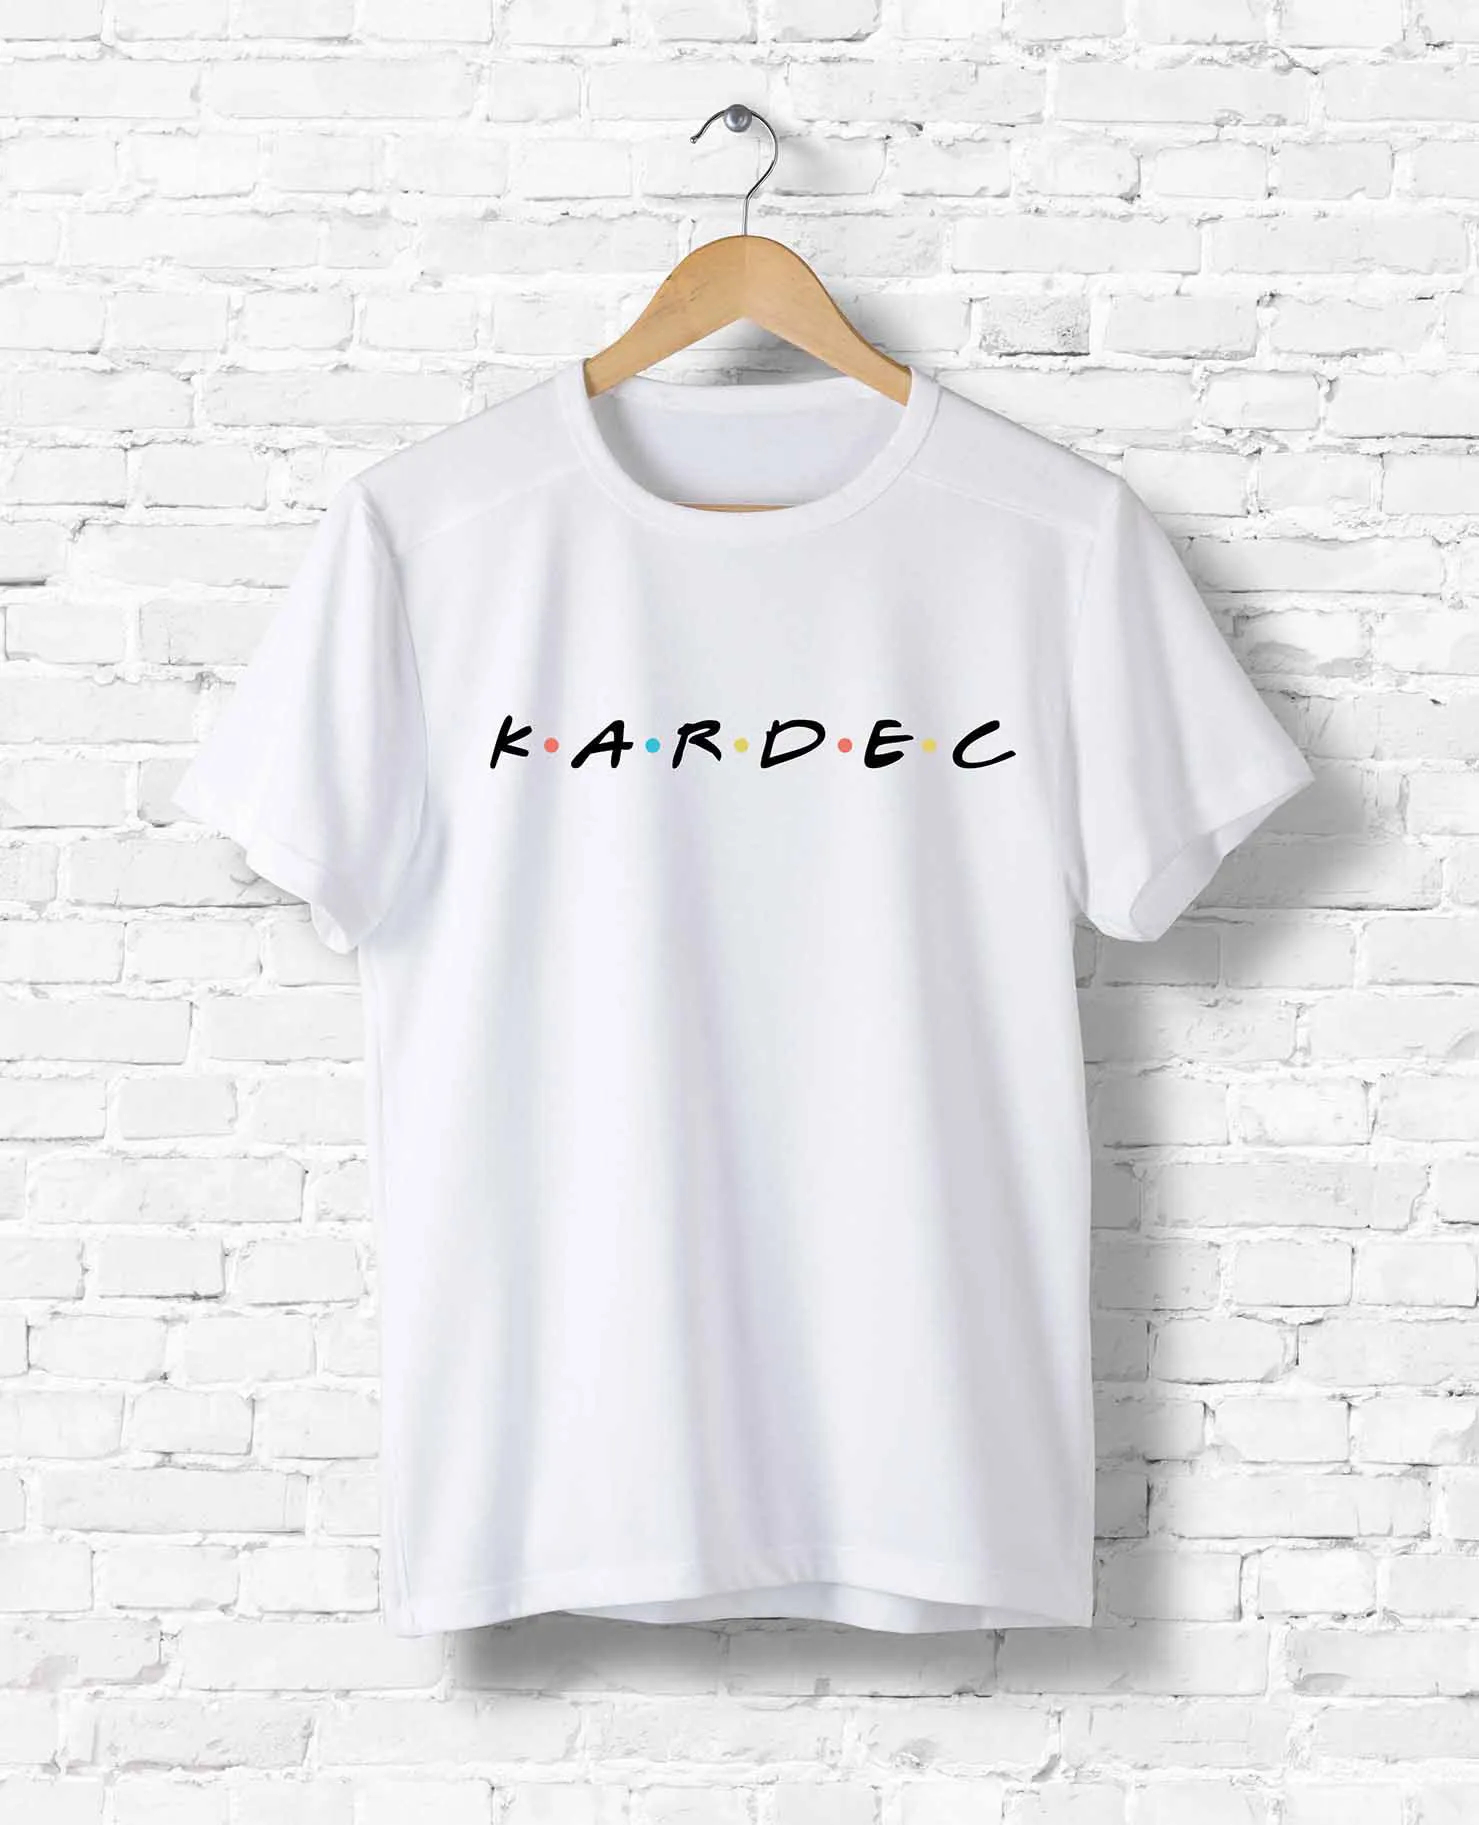 Camiseta Kardec (Friends)